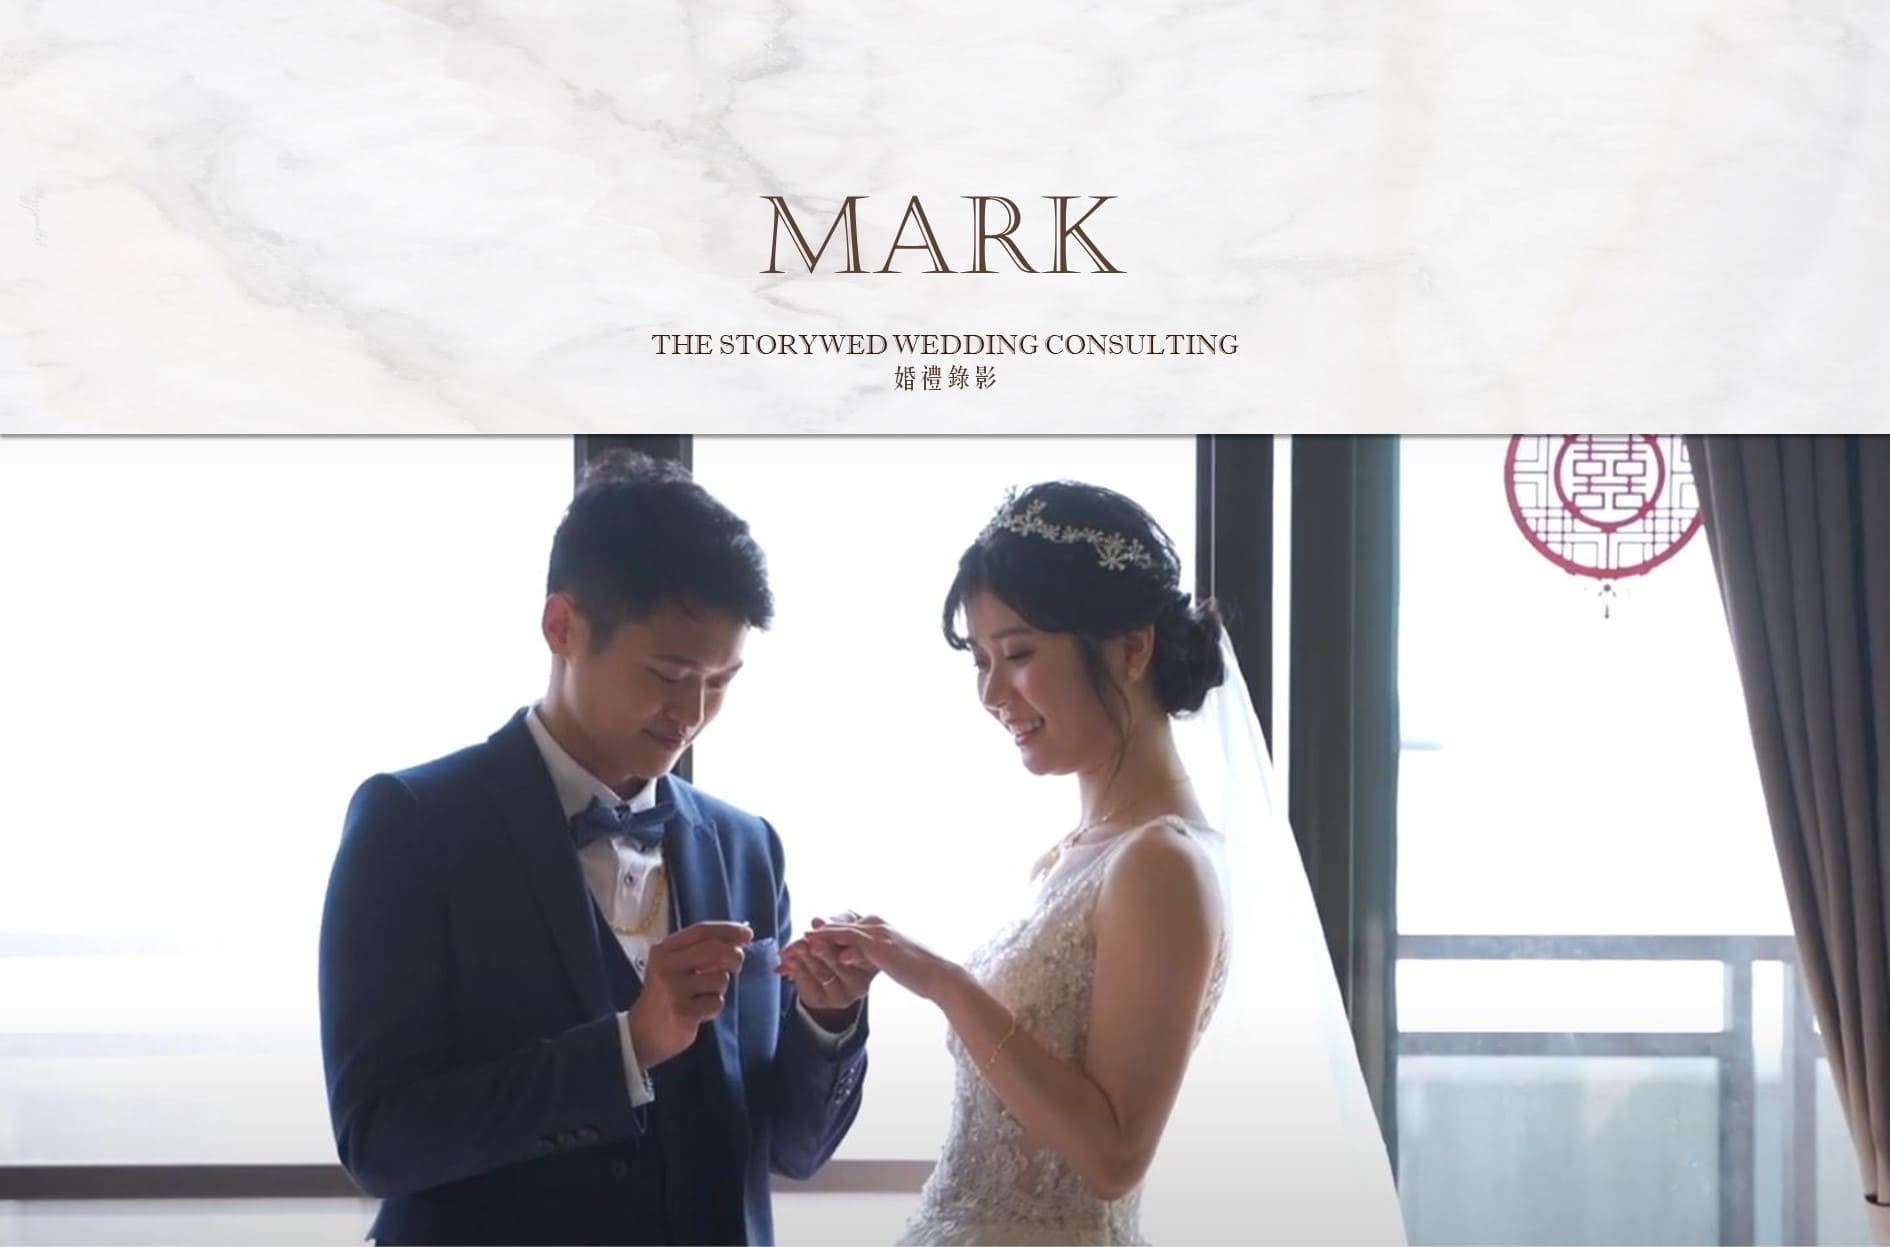 〖婚禮錄影〗Mark